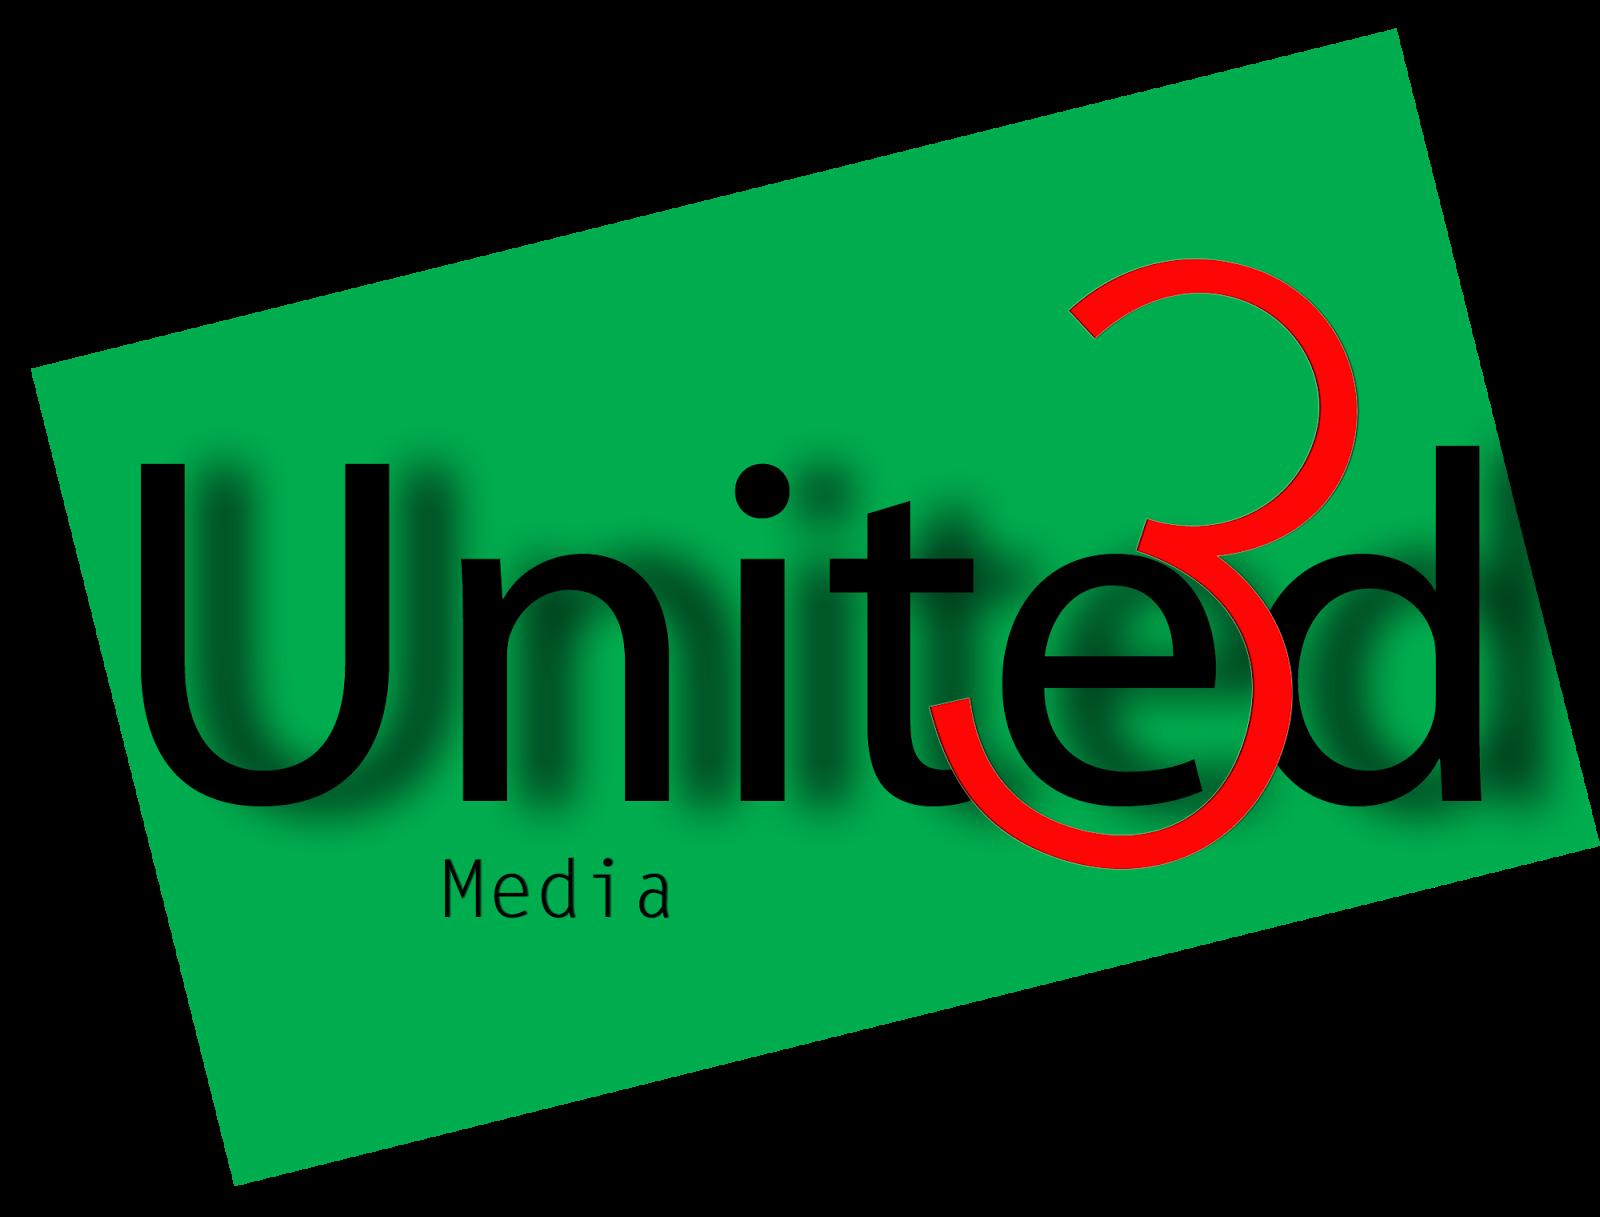 UnitedTHREE Media